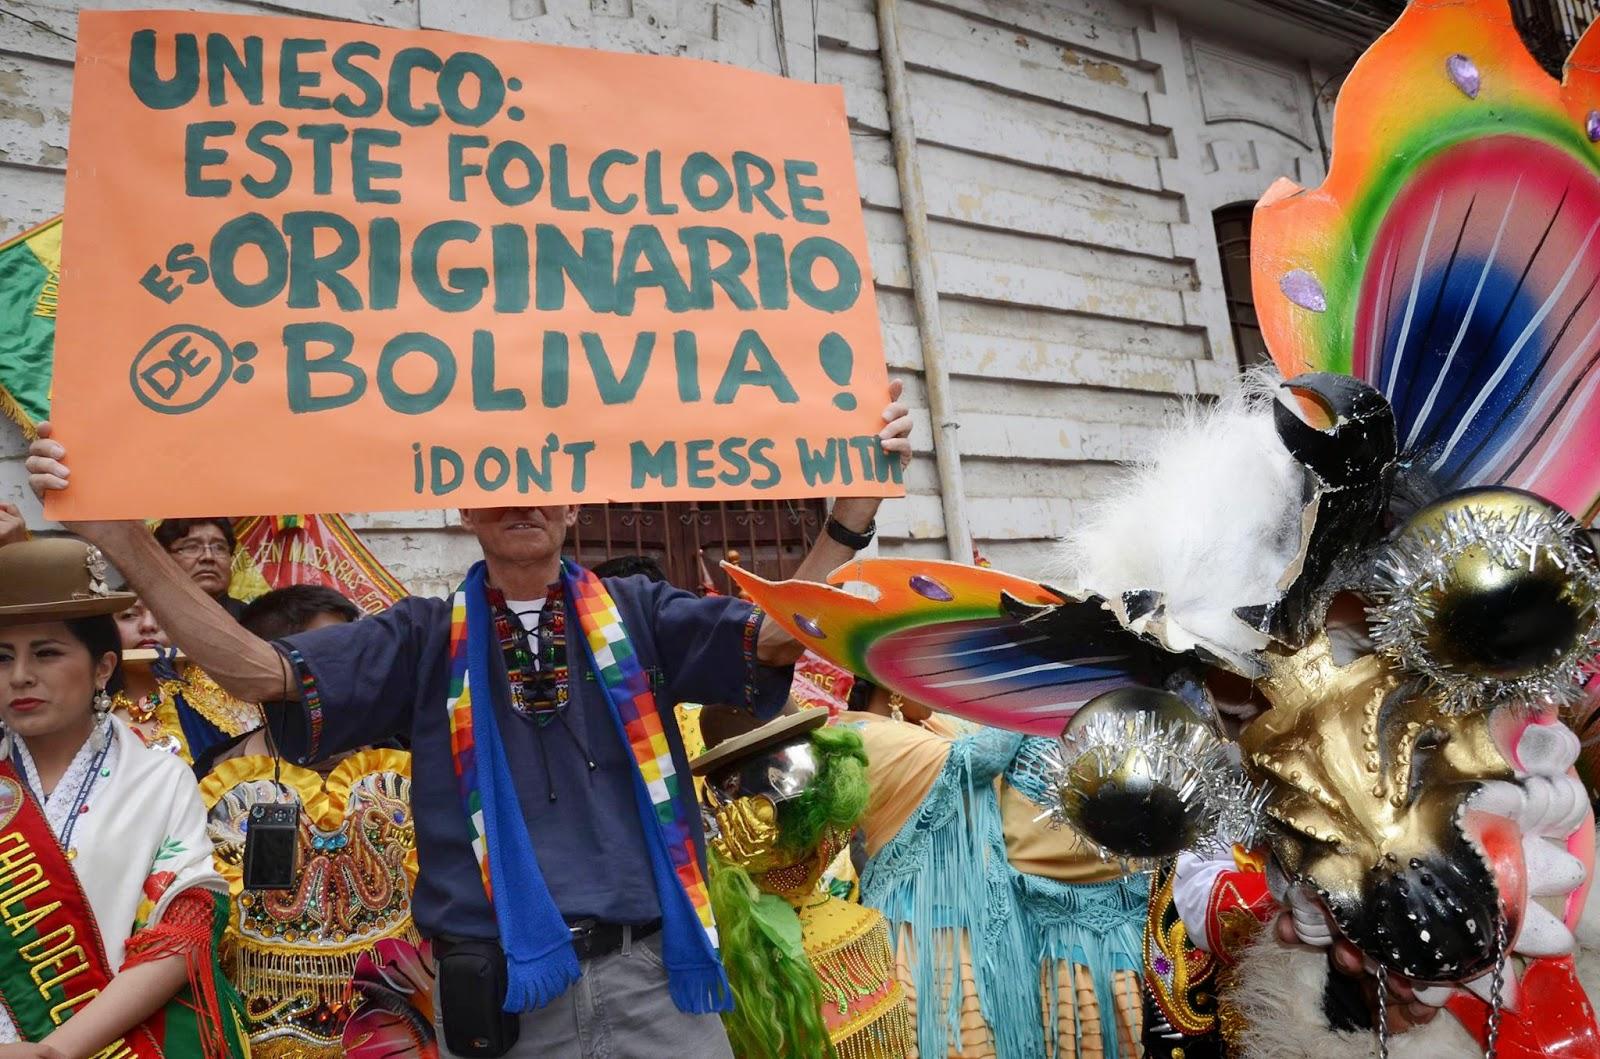 danzas-bolivianas-no-peruanas-viva-bolivia-cochabandido-blog